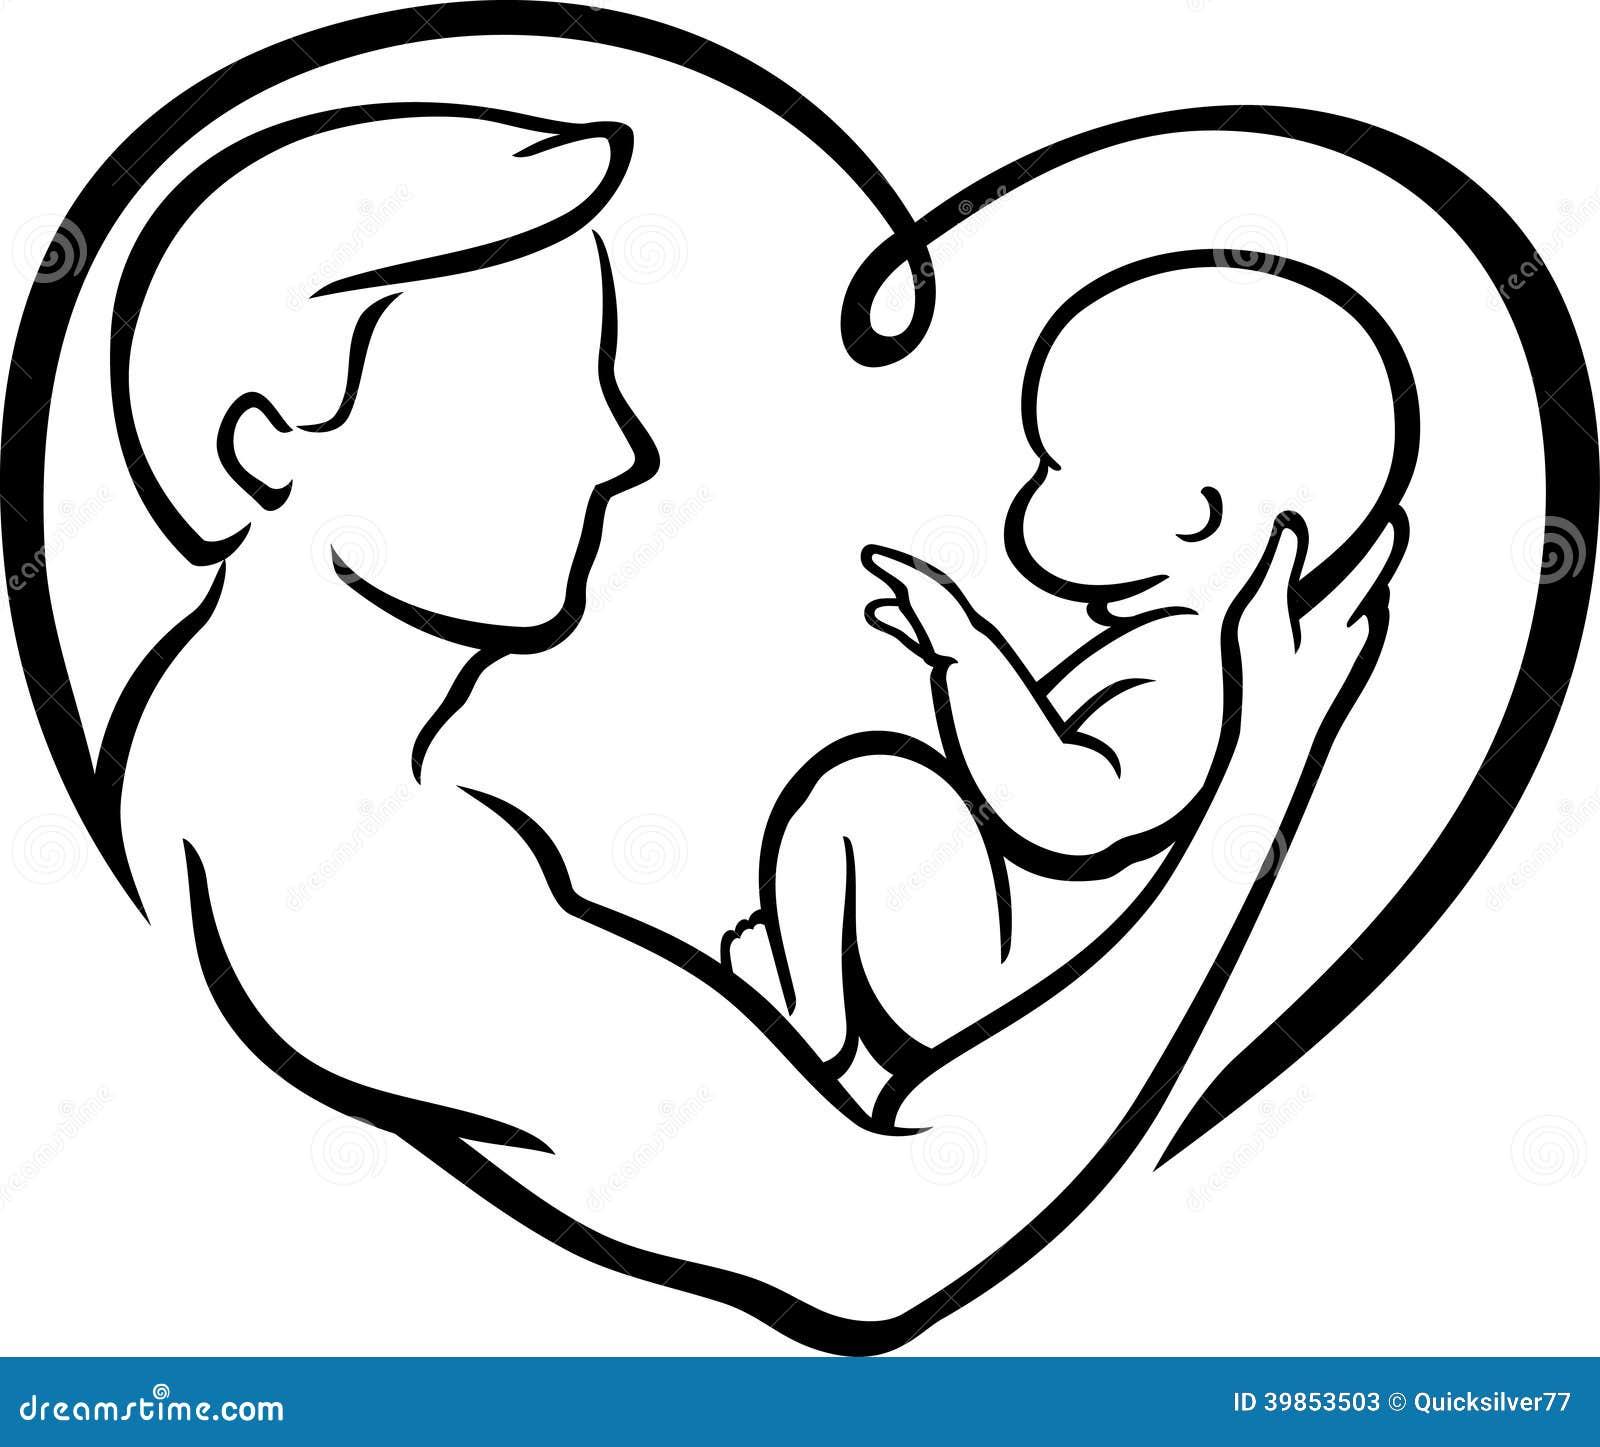 Father son holy spirit symbol gallery symbol and sign ideas and son symbol father and son symbol buycottarizona biocorpaavc